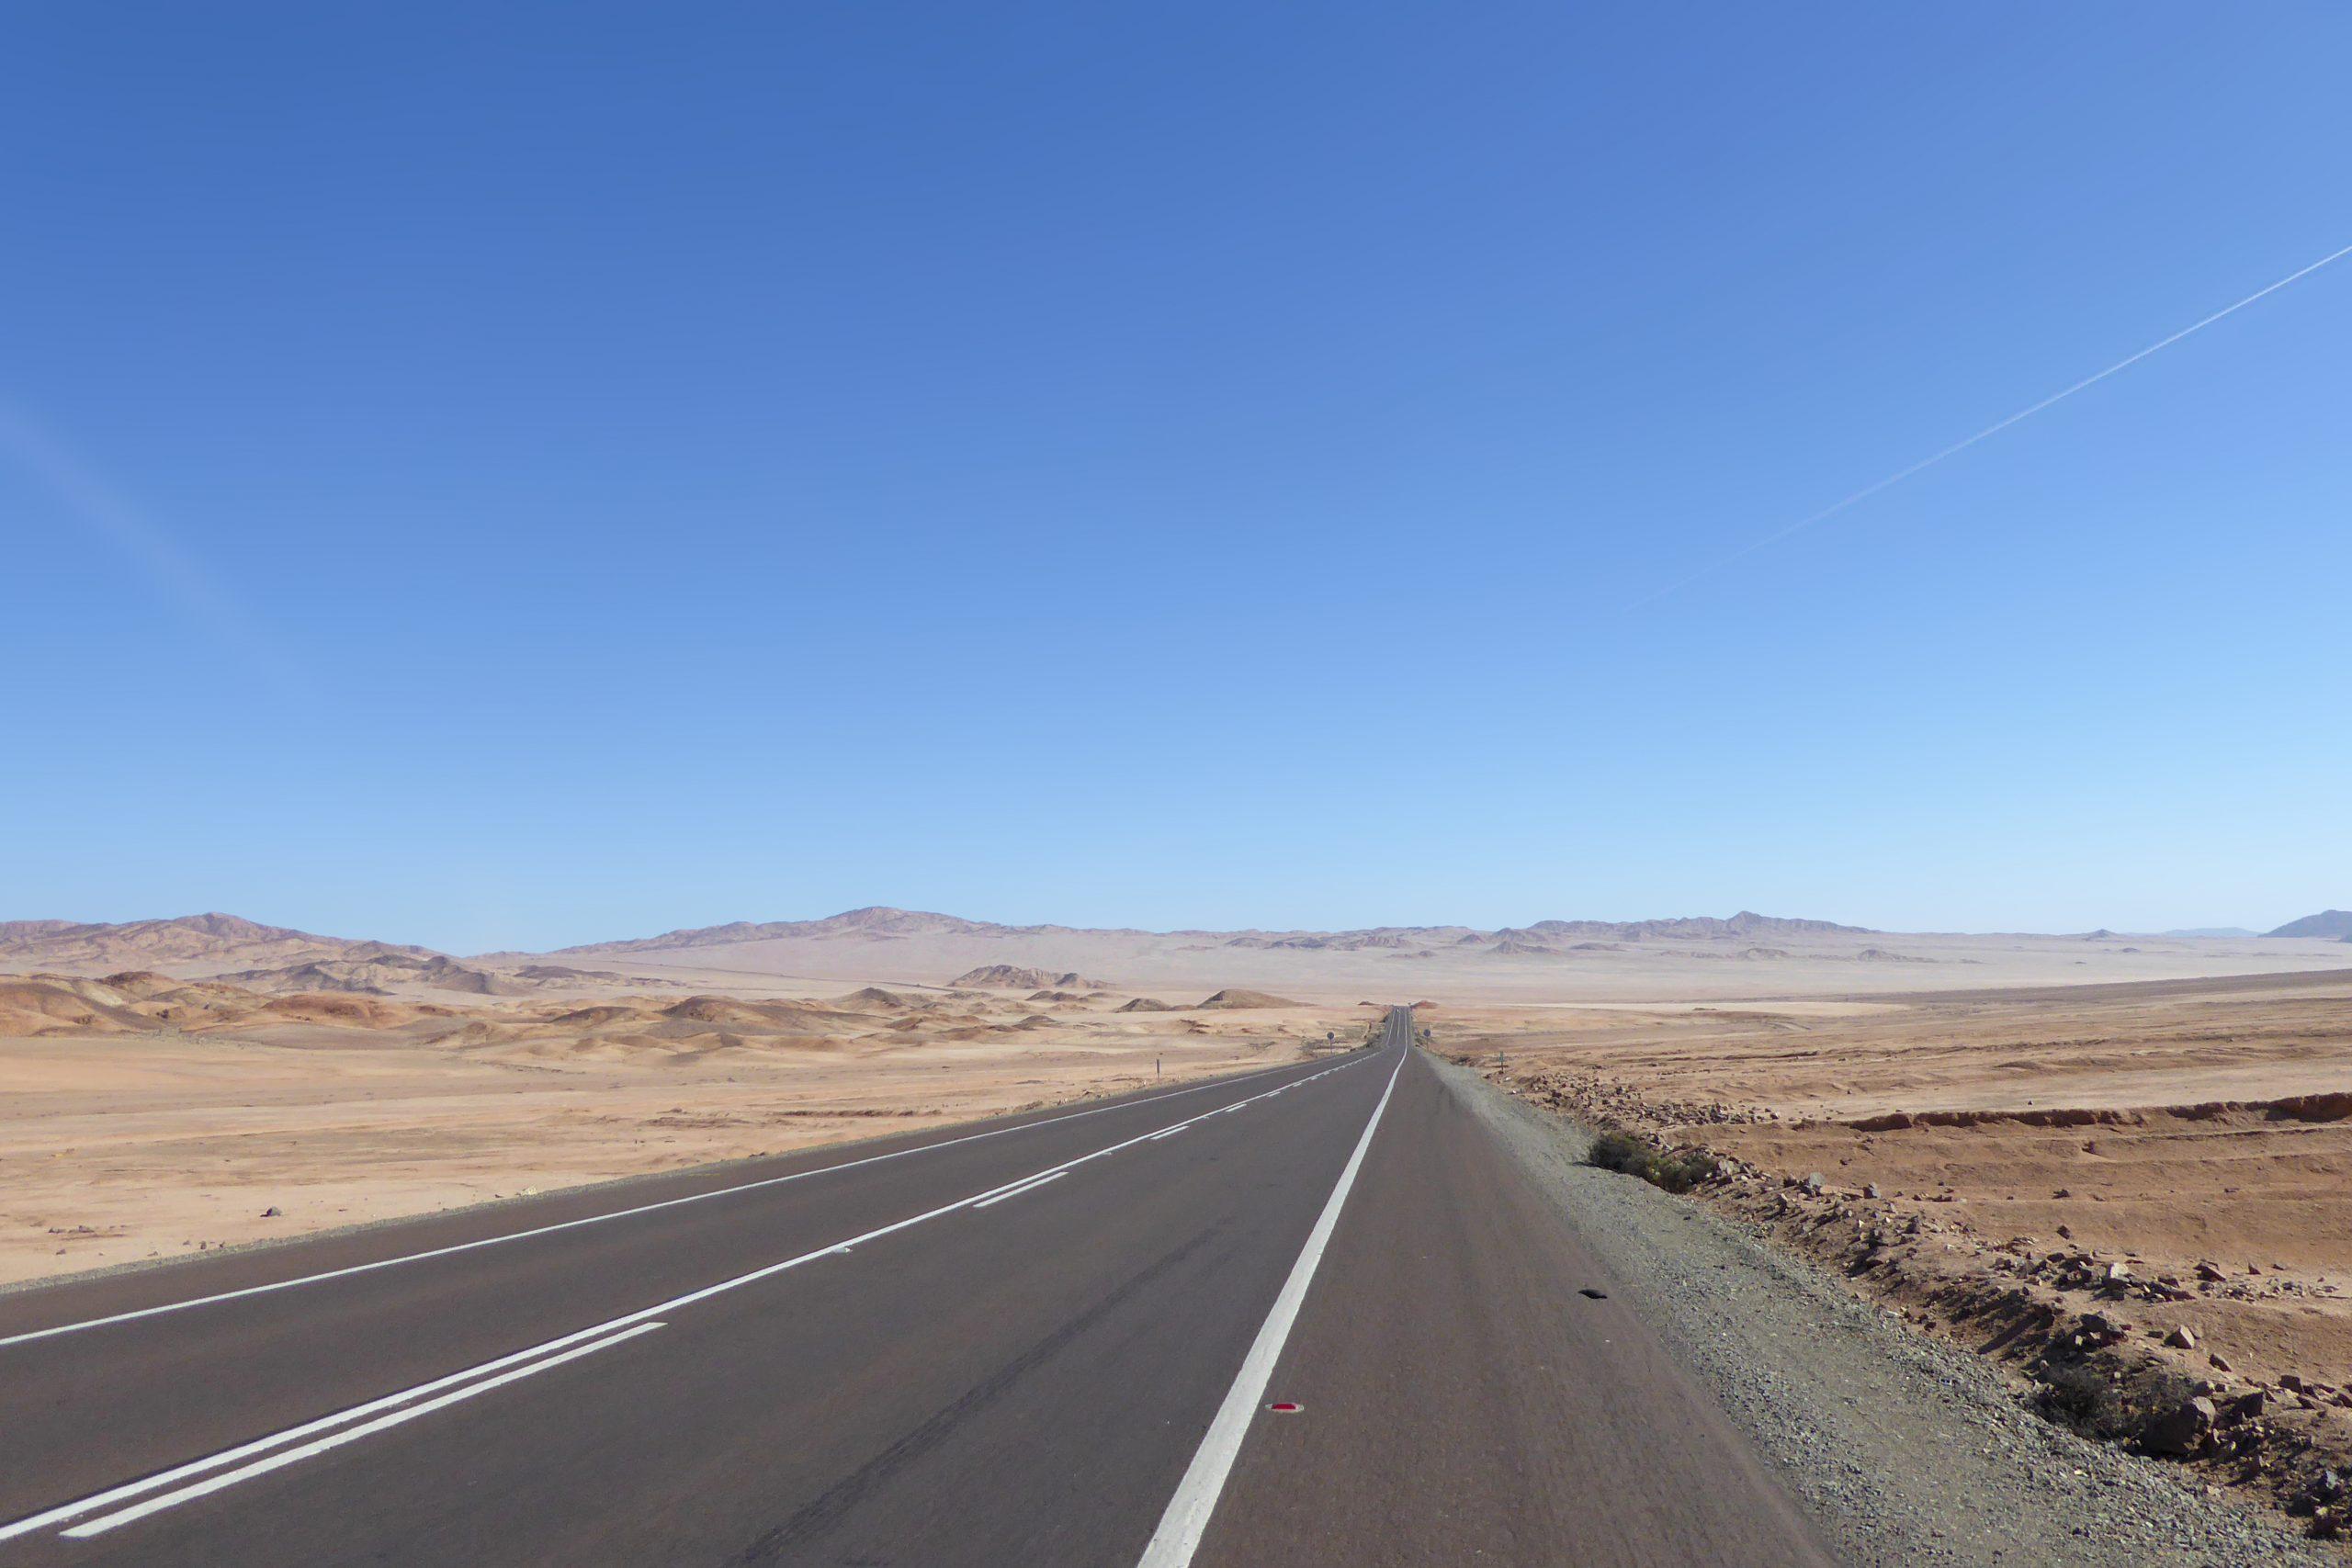 Radreise Südamerika 2019 - RN5 - Panamericana